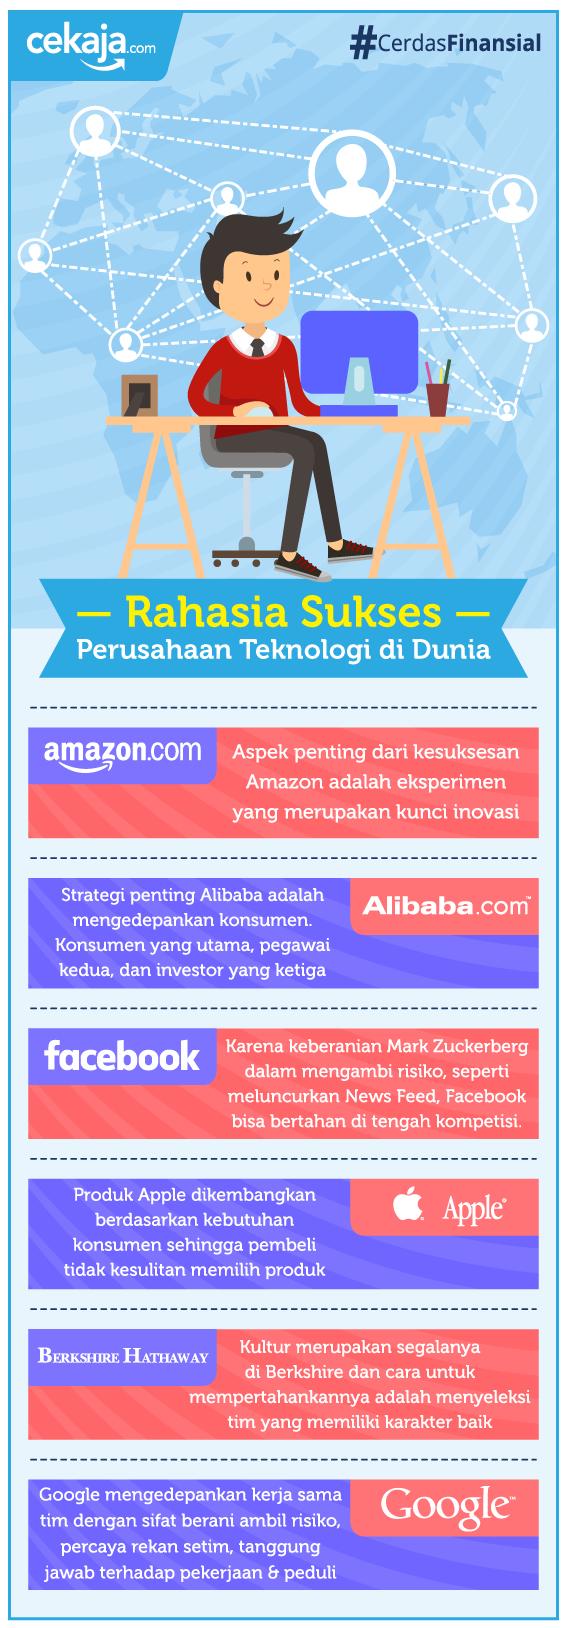 infografis-kunci-sukses-perusahaan-besar-cekaja.com